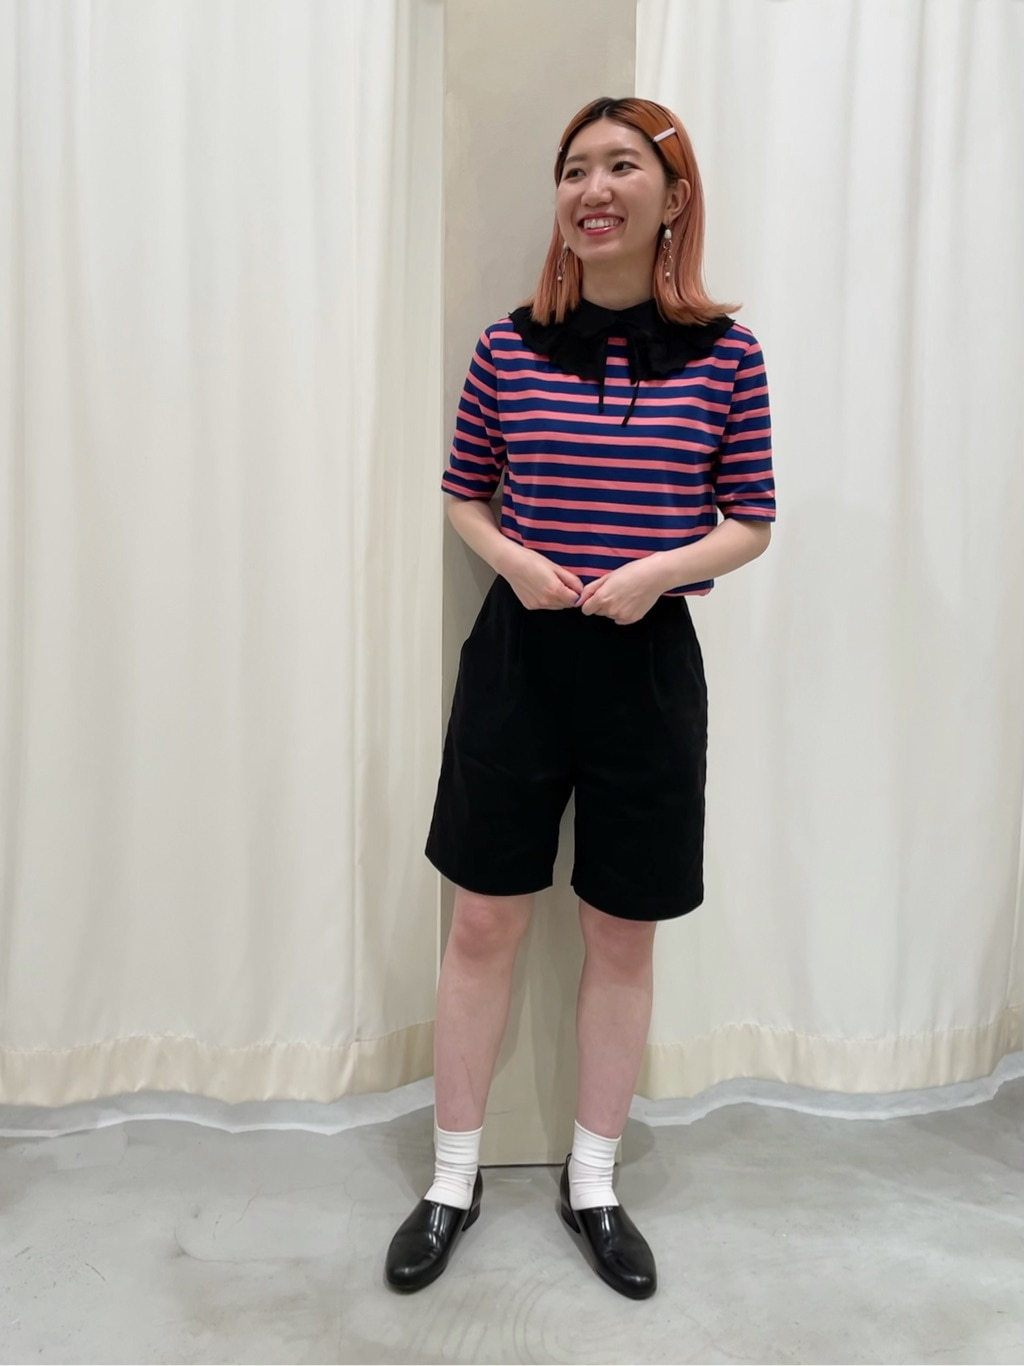 CHILD WOMAN , PAR ICI 東京スカイツリータウン・ソラマチ 2021.06.07